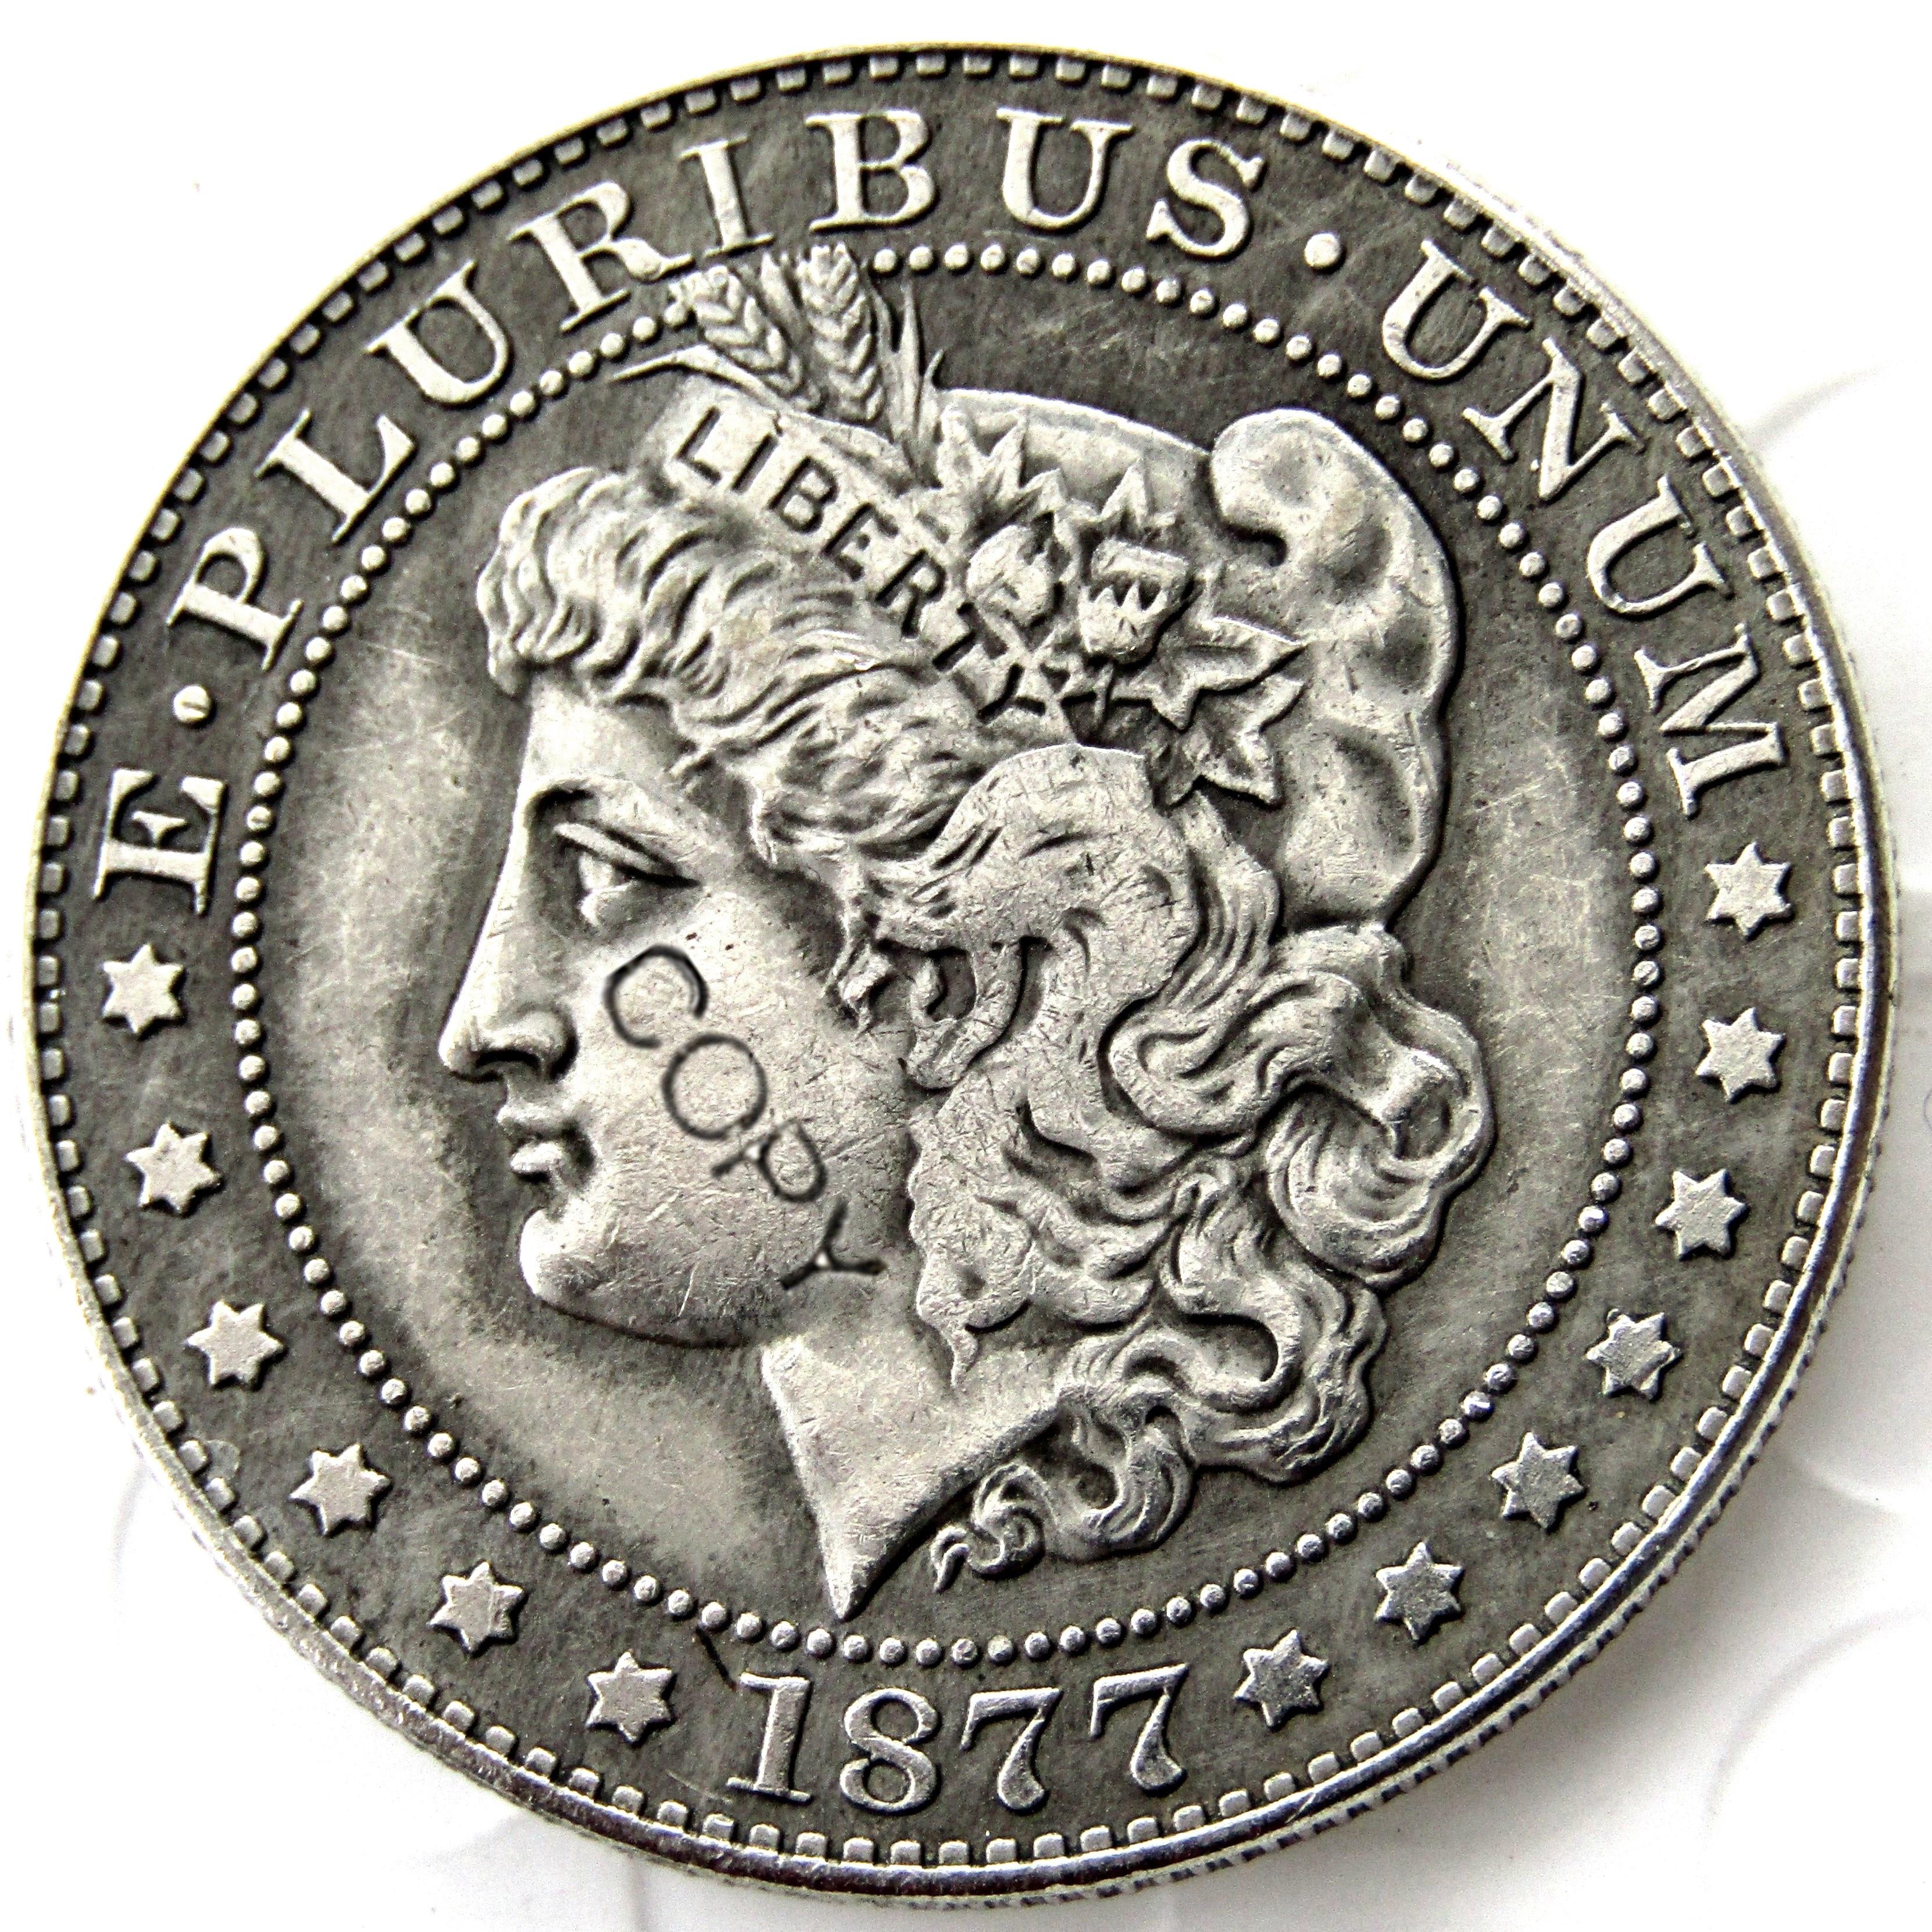 Moedas americanas 1877 morgan meio dólar moeda de cópia banhado a prata